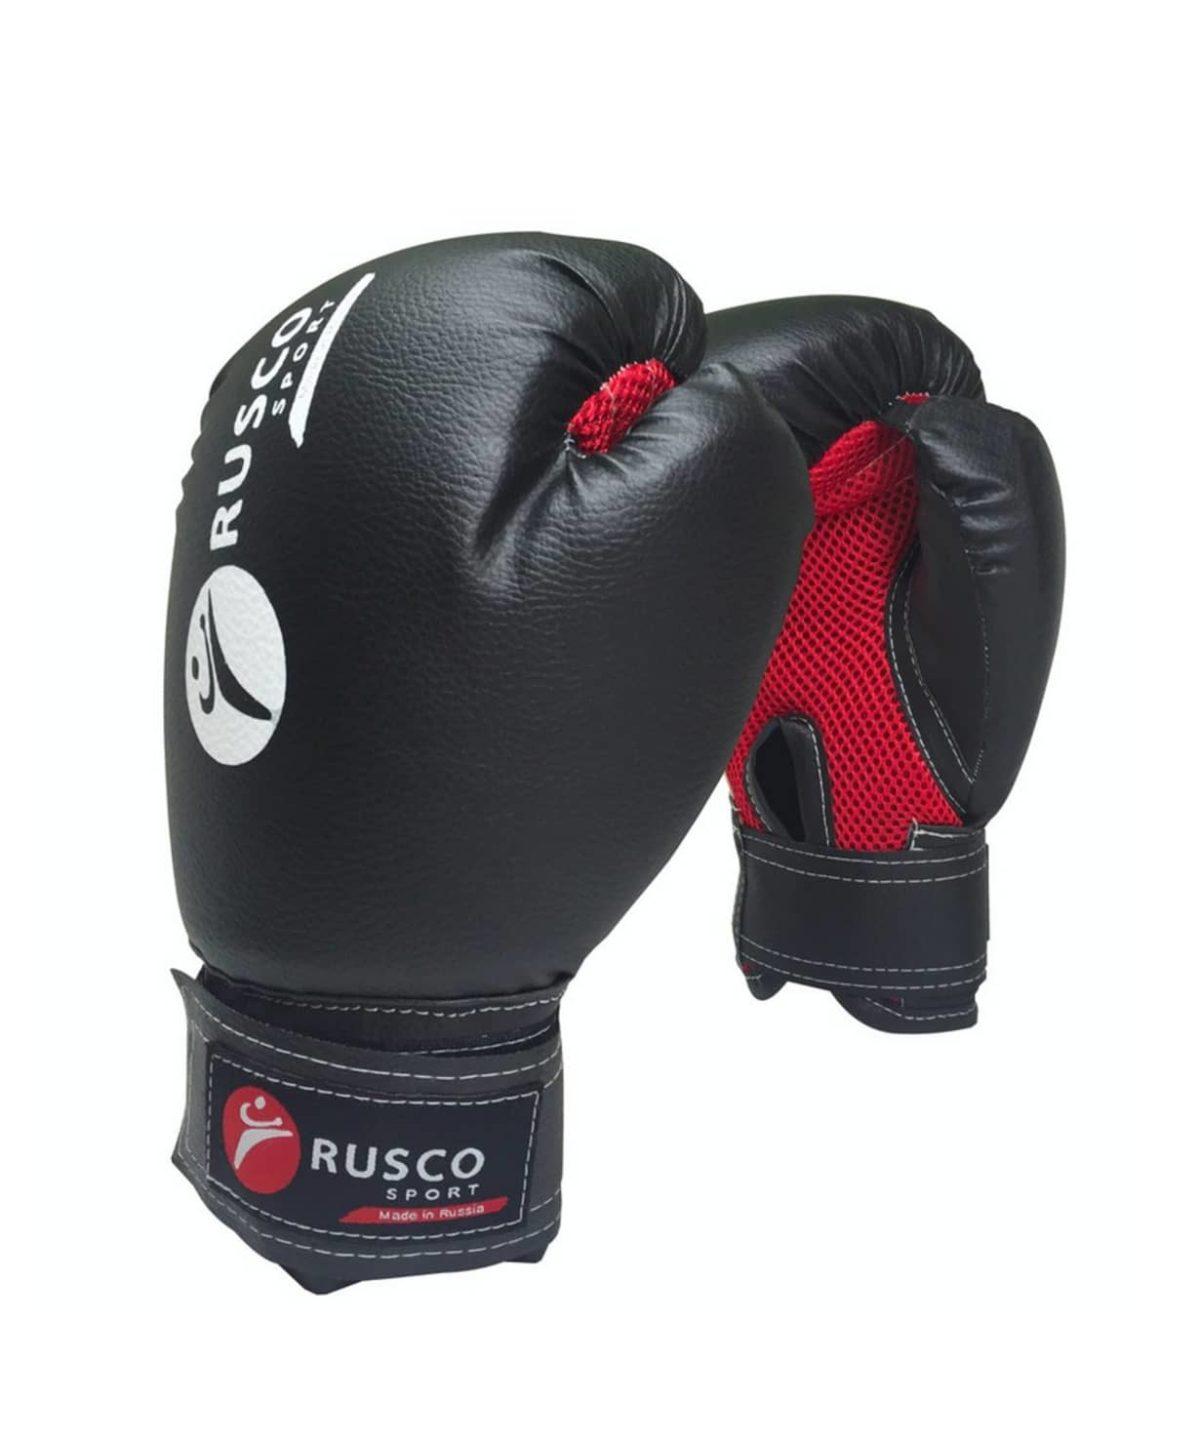 RUSCO Перчатки бокс. 6oz, к/з  18528 - 1